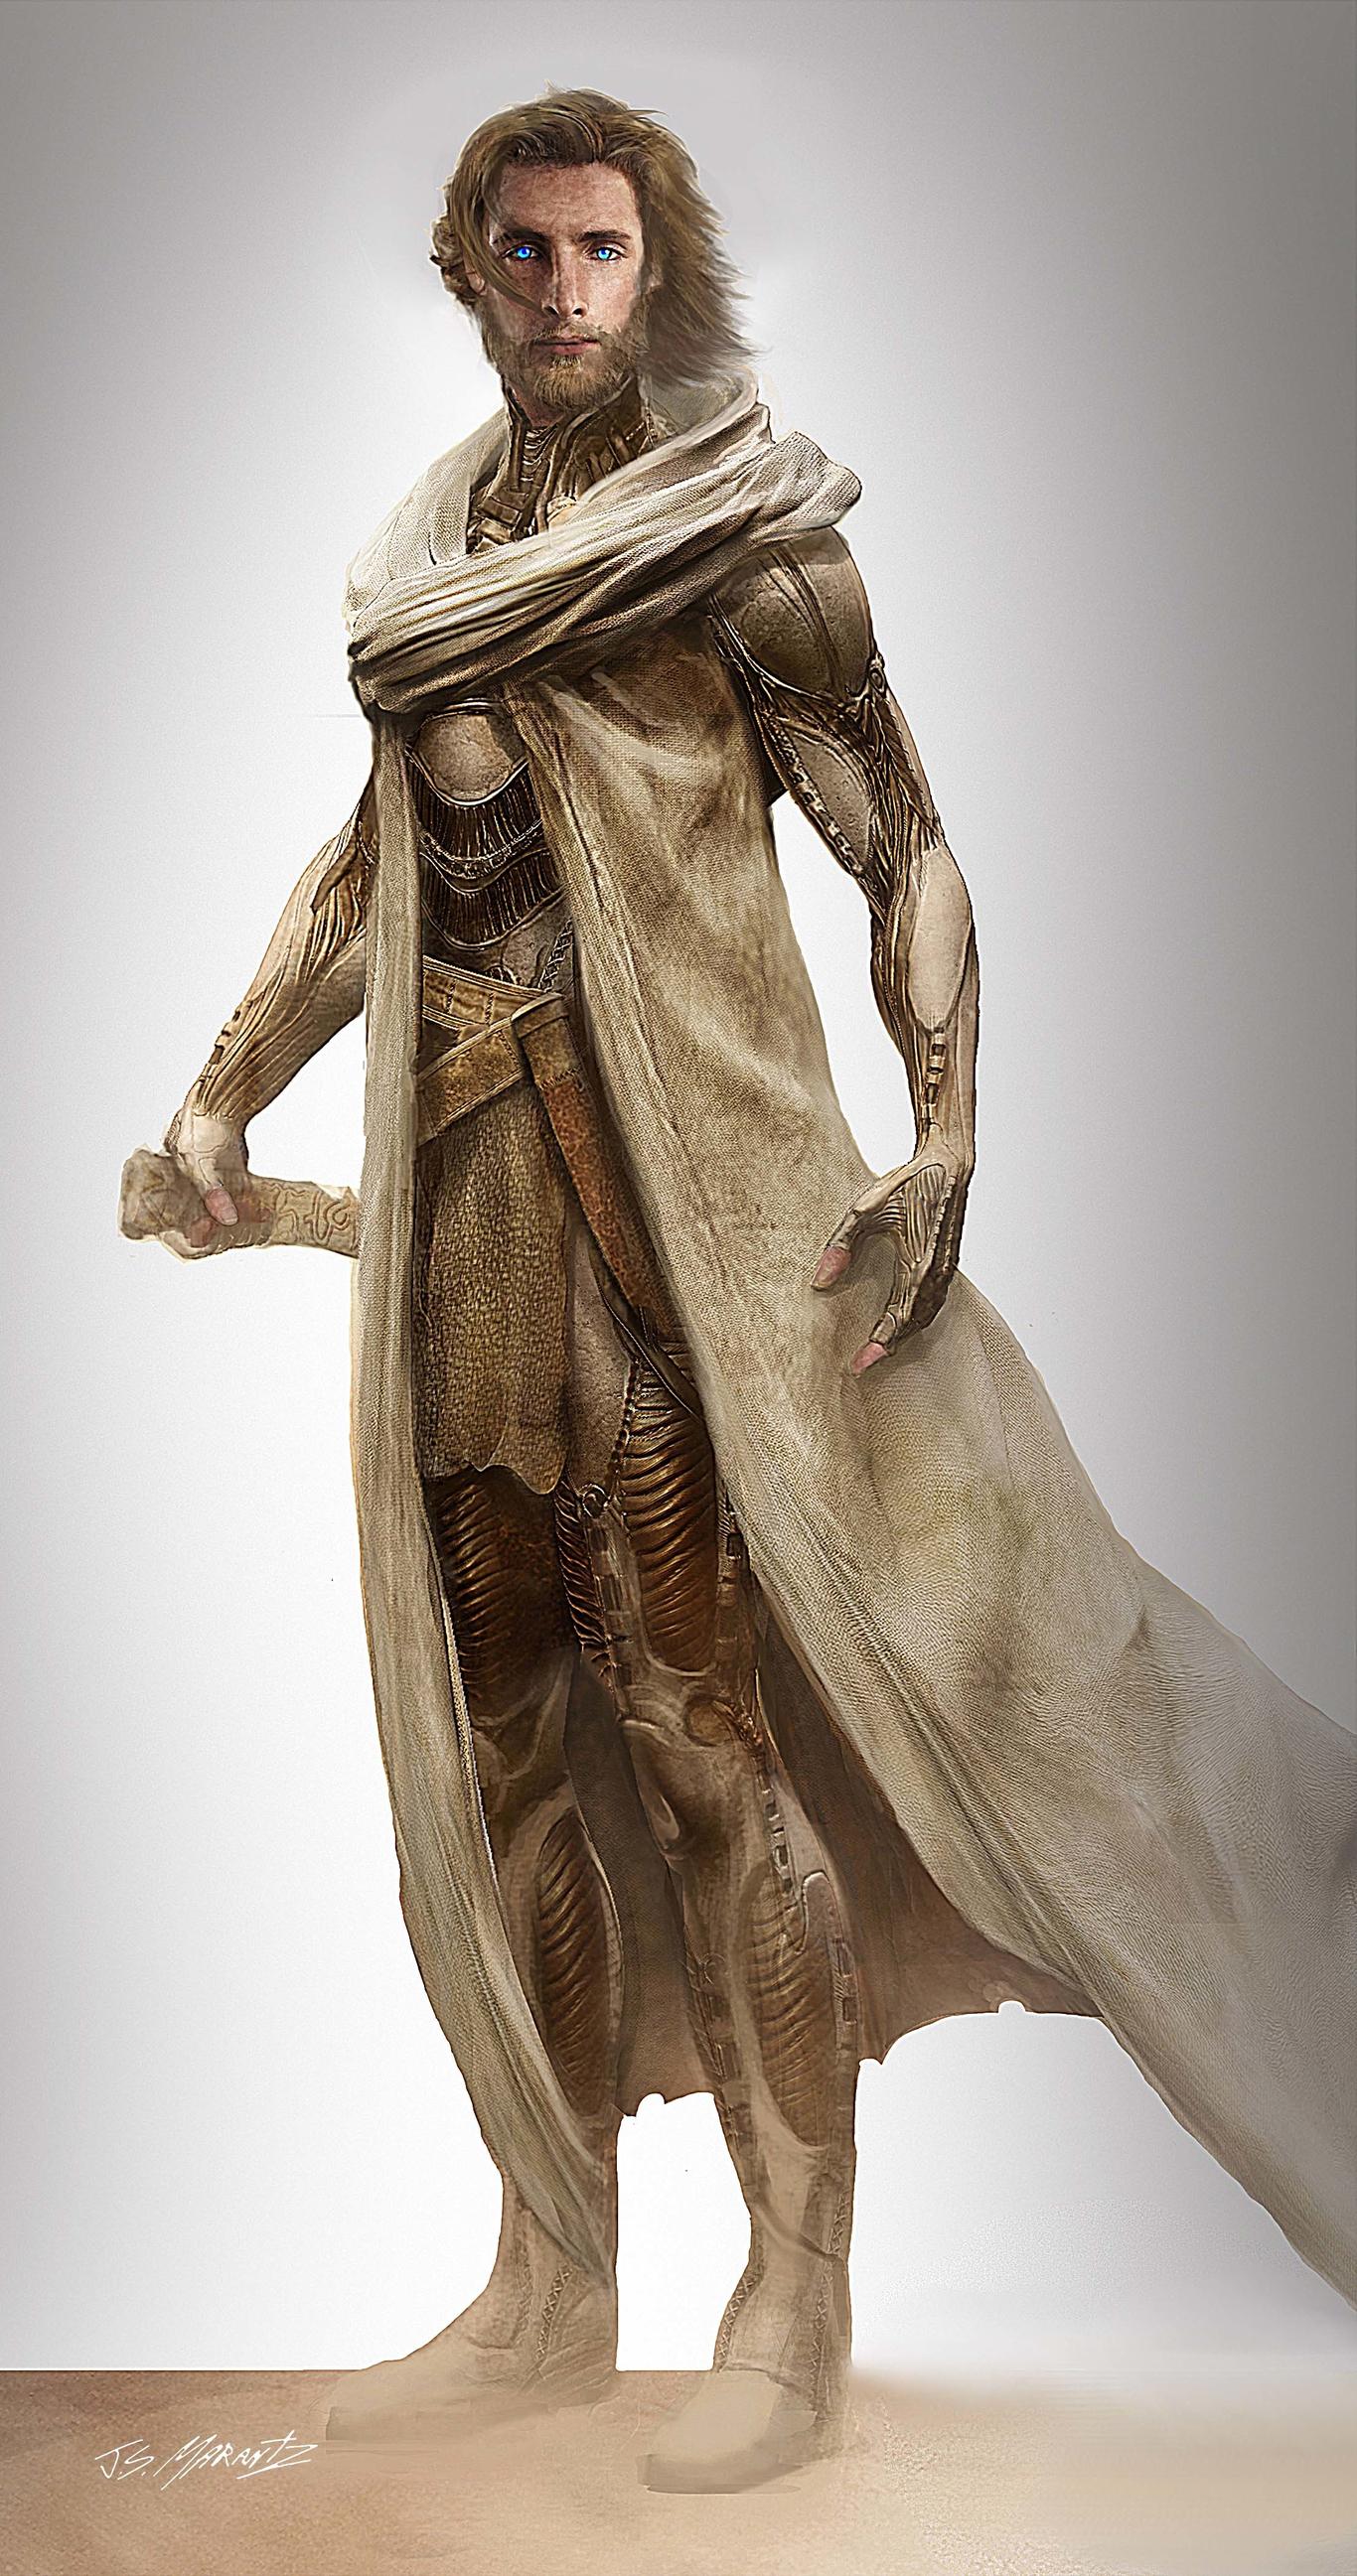 Dune Concept Art By Jeradsmarantz Fantasy 3d Cgsociety